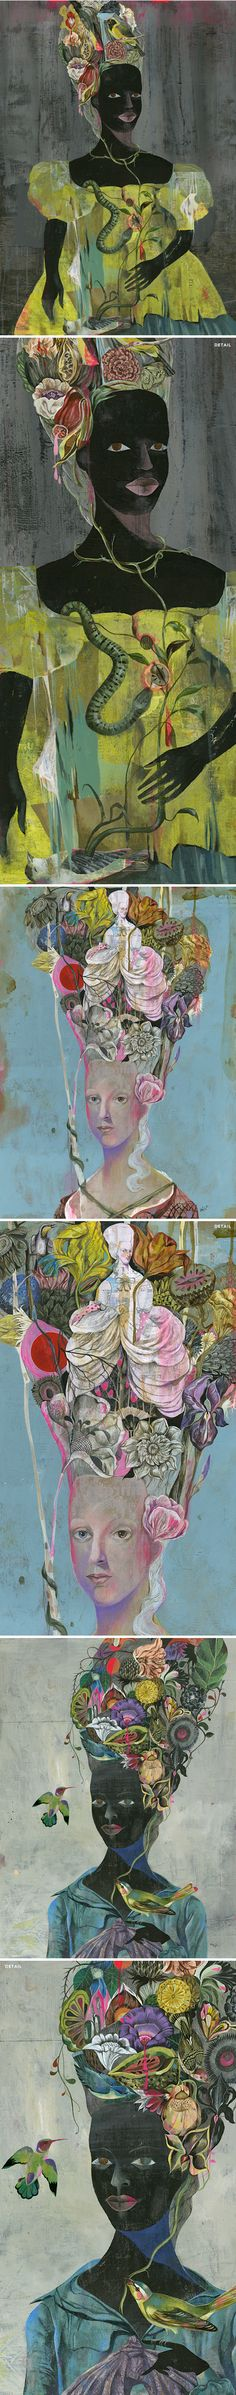 The Jealous Curator /// curated contemporary art  /// olaf hajek